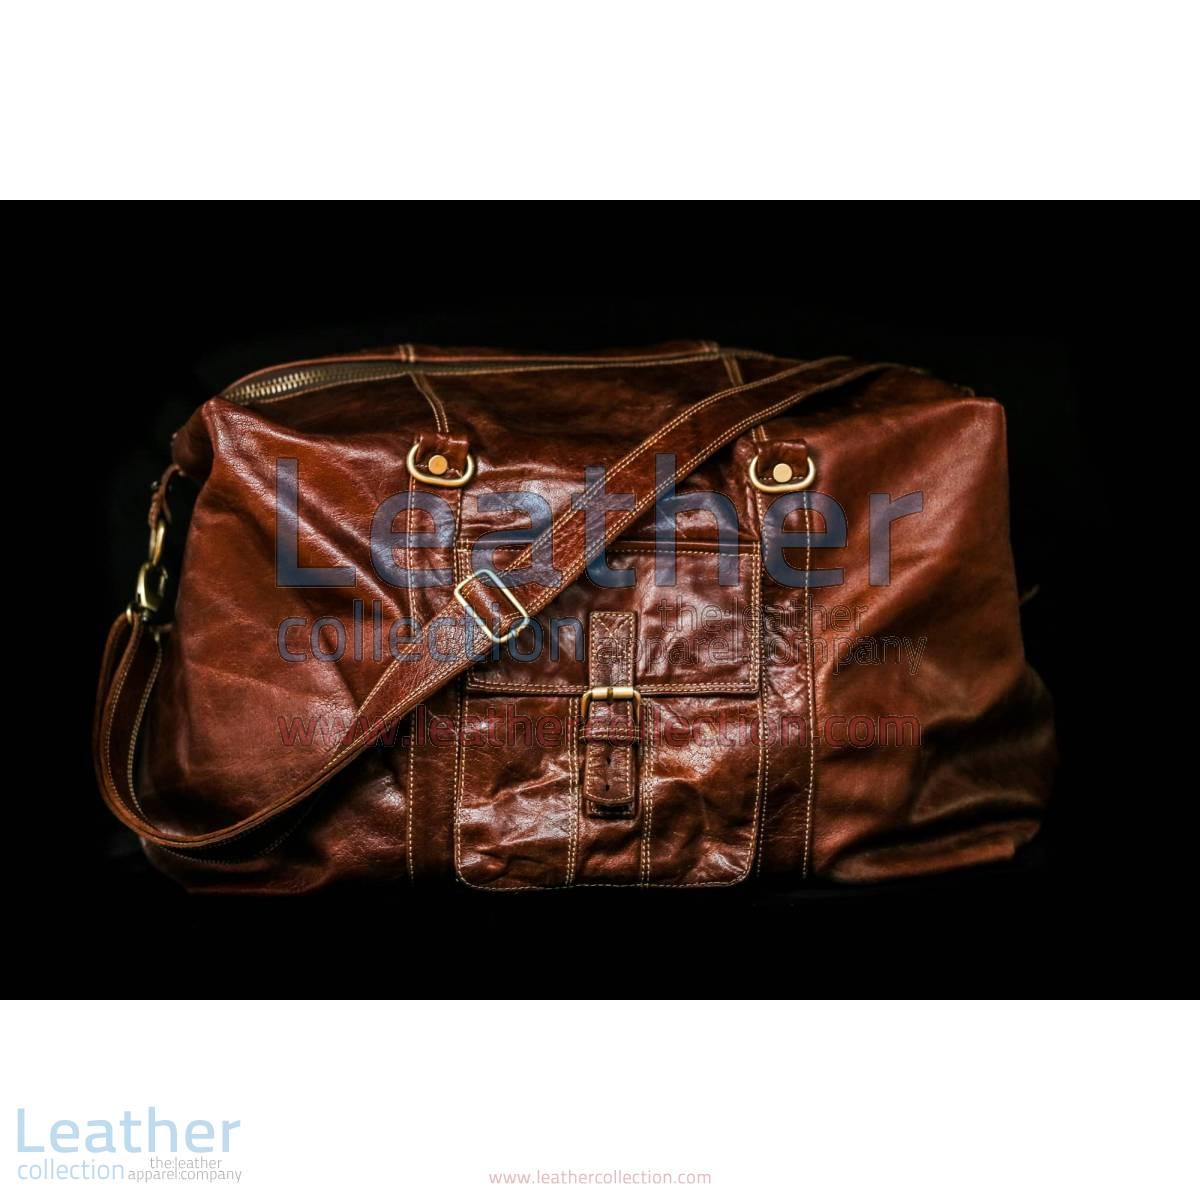 Rome Leather Luggage Bag